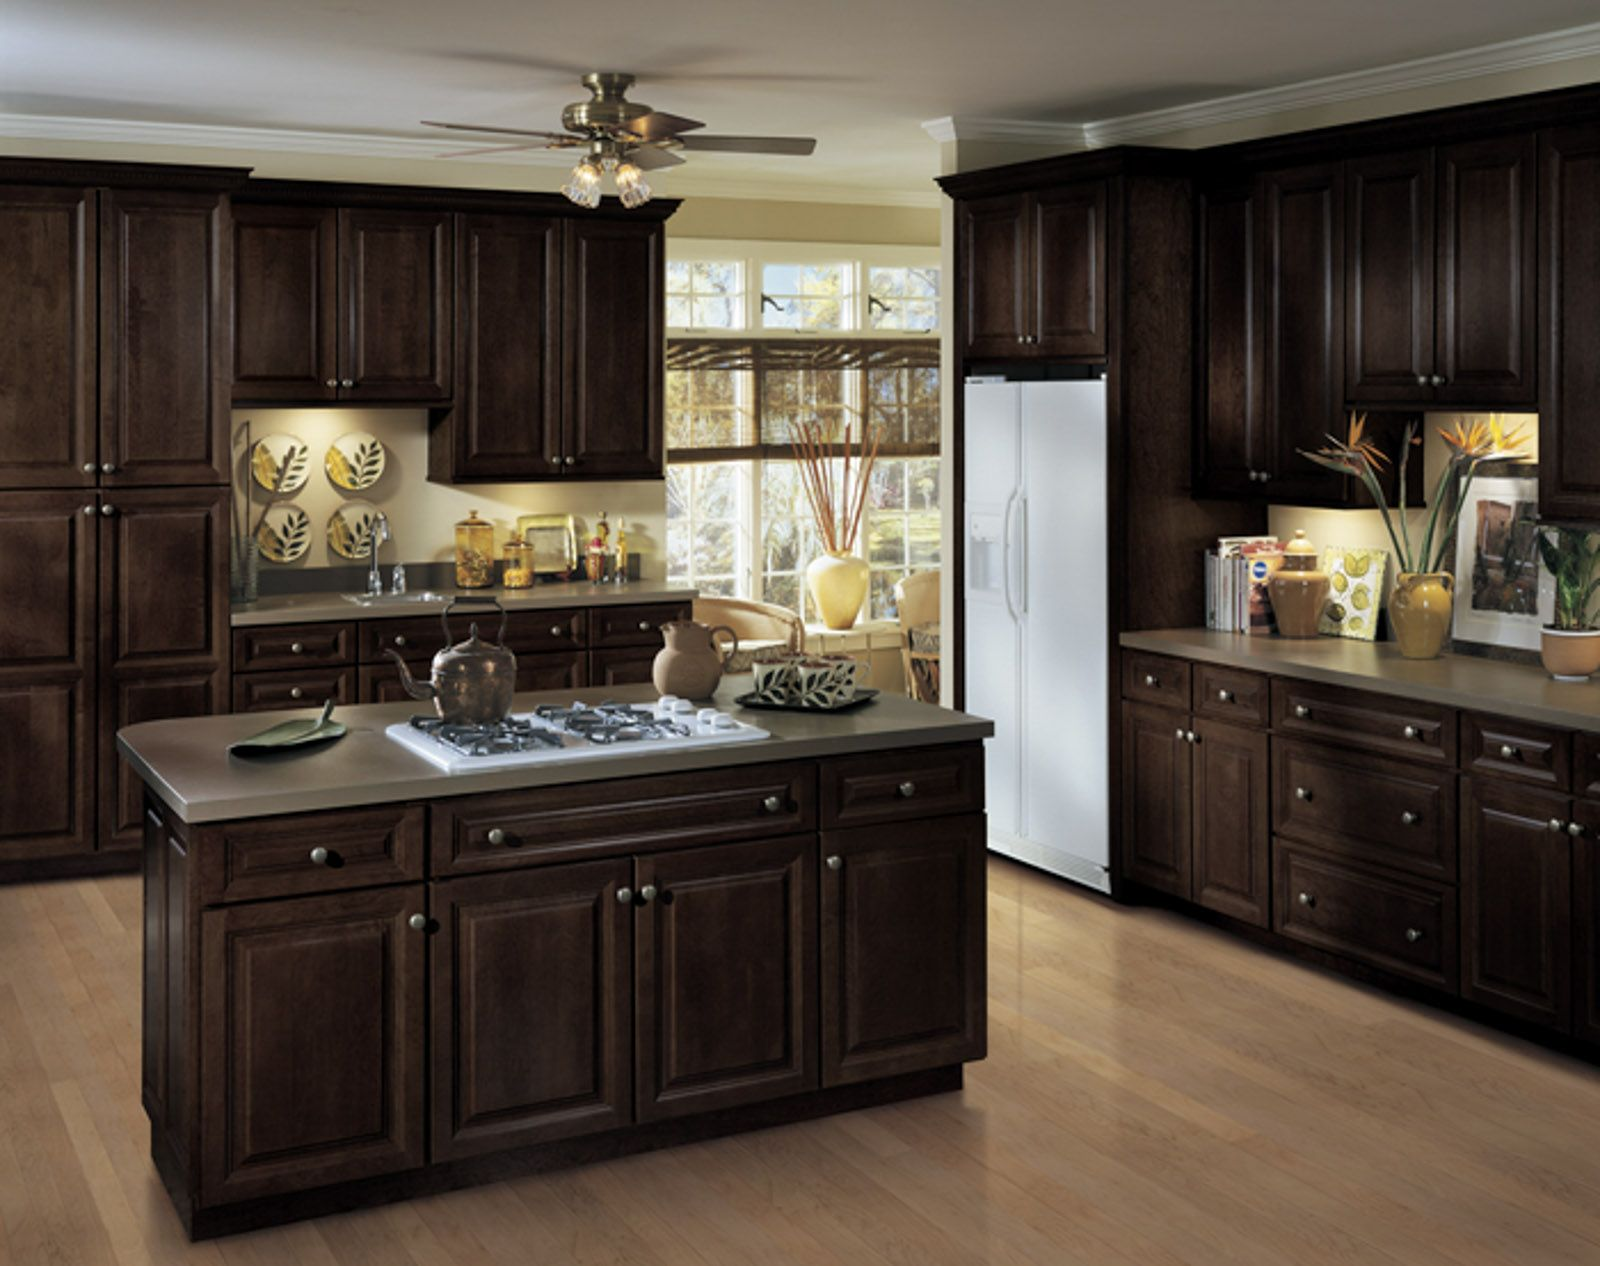 Langdon 5pc Echelon Cabinets Kitchen Dinning Room Cabinet Kitchen Cabinets